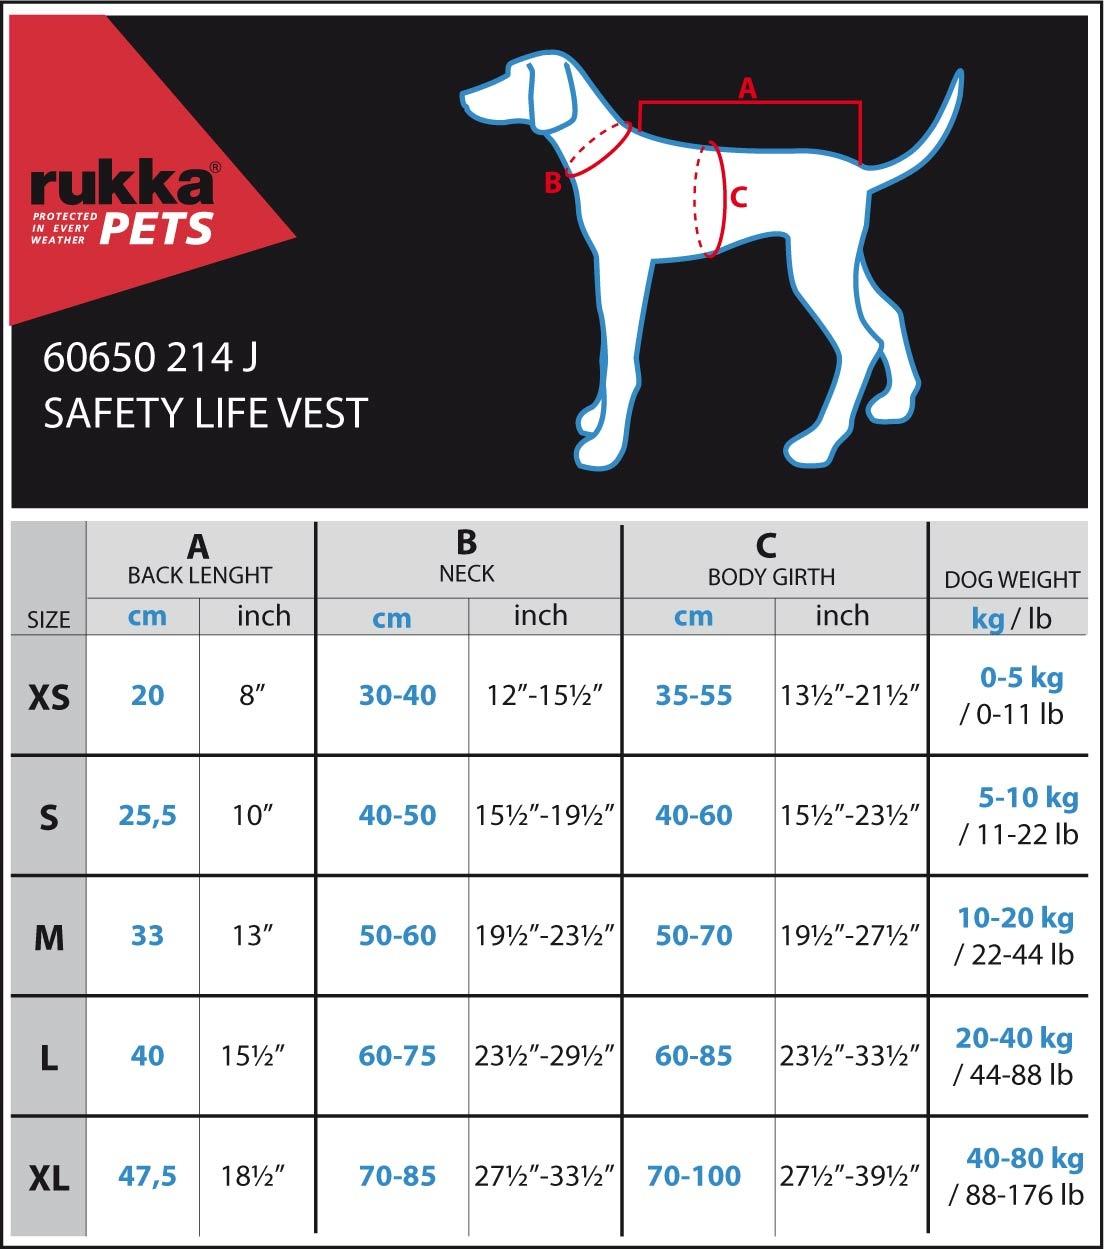 RukkaPets maattabel Safety Life Vest